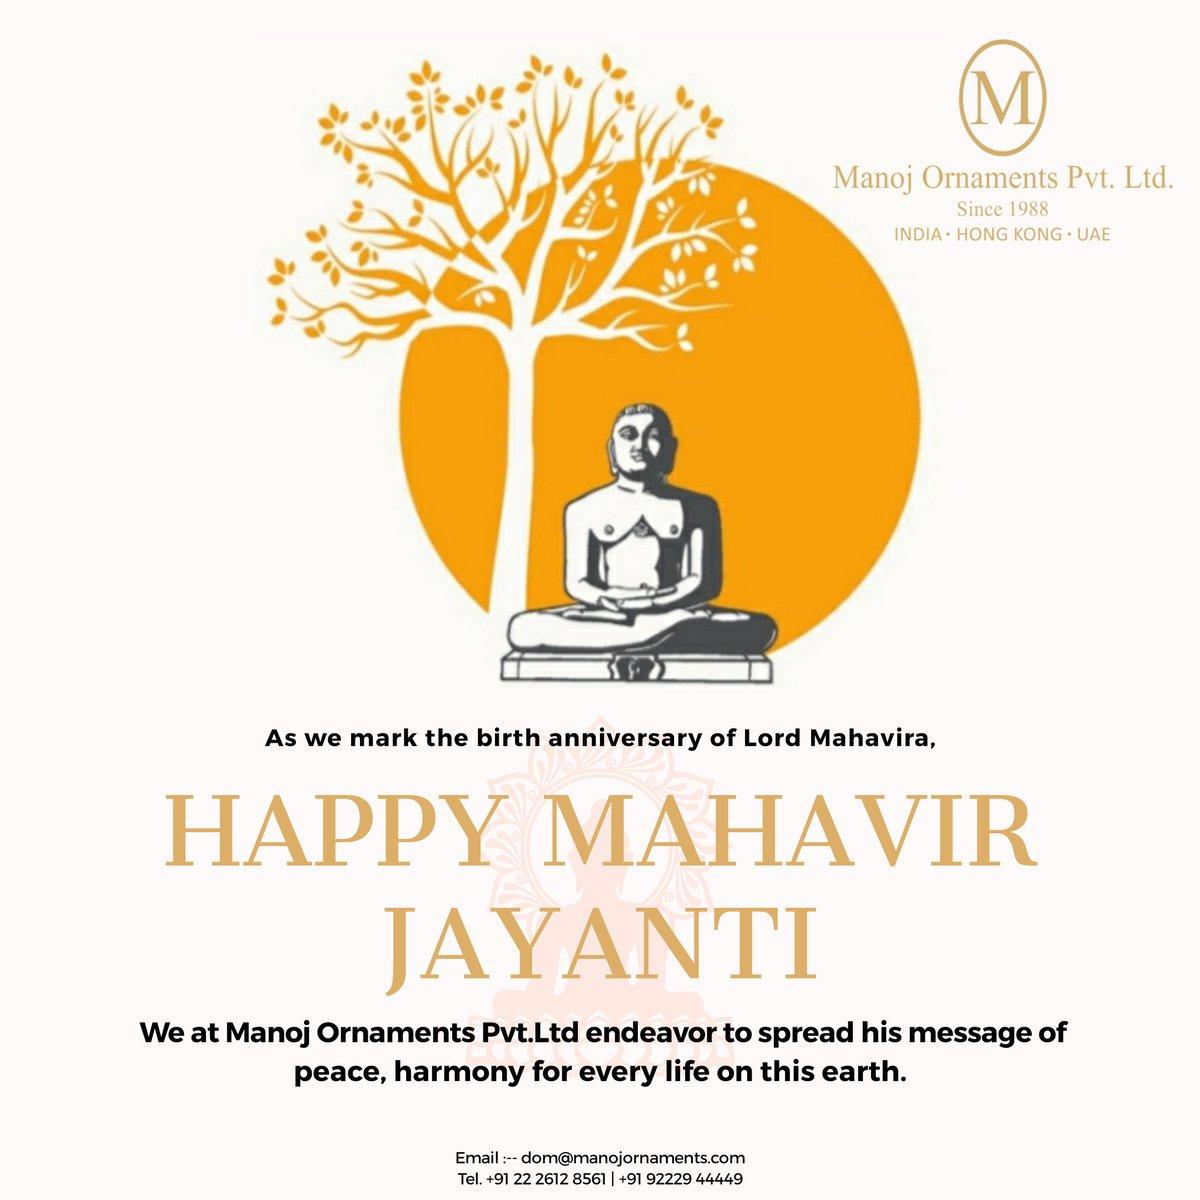 #MahavirJayanti #MahavirJanmaKalyanak #MahaveerJanmaKalyanak #MahaveerJayanti #महावीरजयंती #ManojOrnamentsPvtLtd #Mumbai #indianjewellery #indianjewelleryusa #indianbridaljewellery #modernjewellerydesign #contemproryjewellery #handmadejewelrydesigner #indianfestival